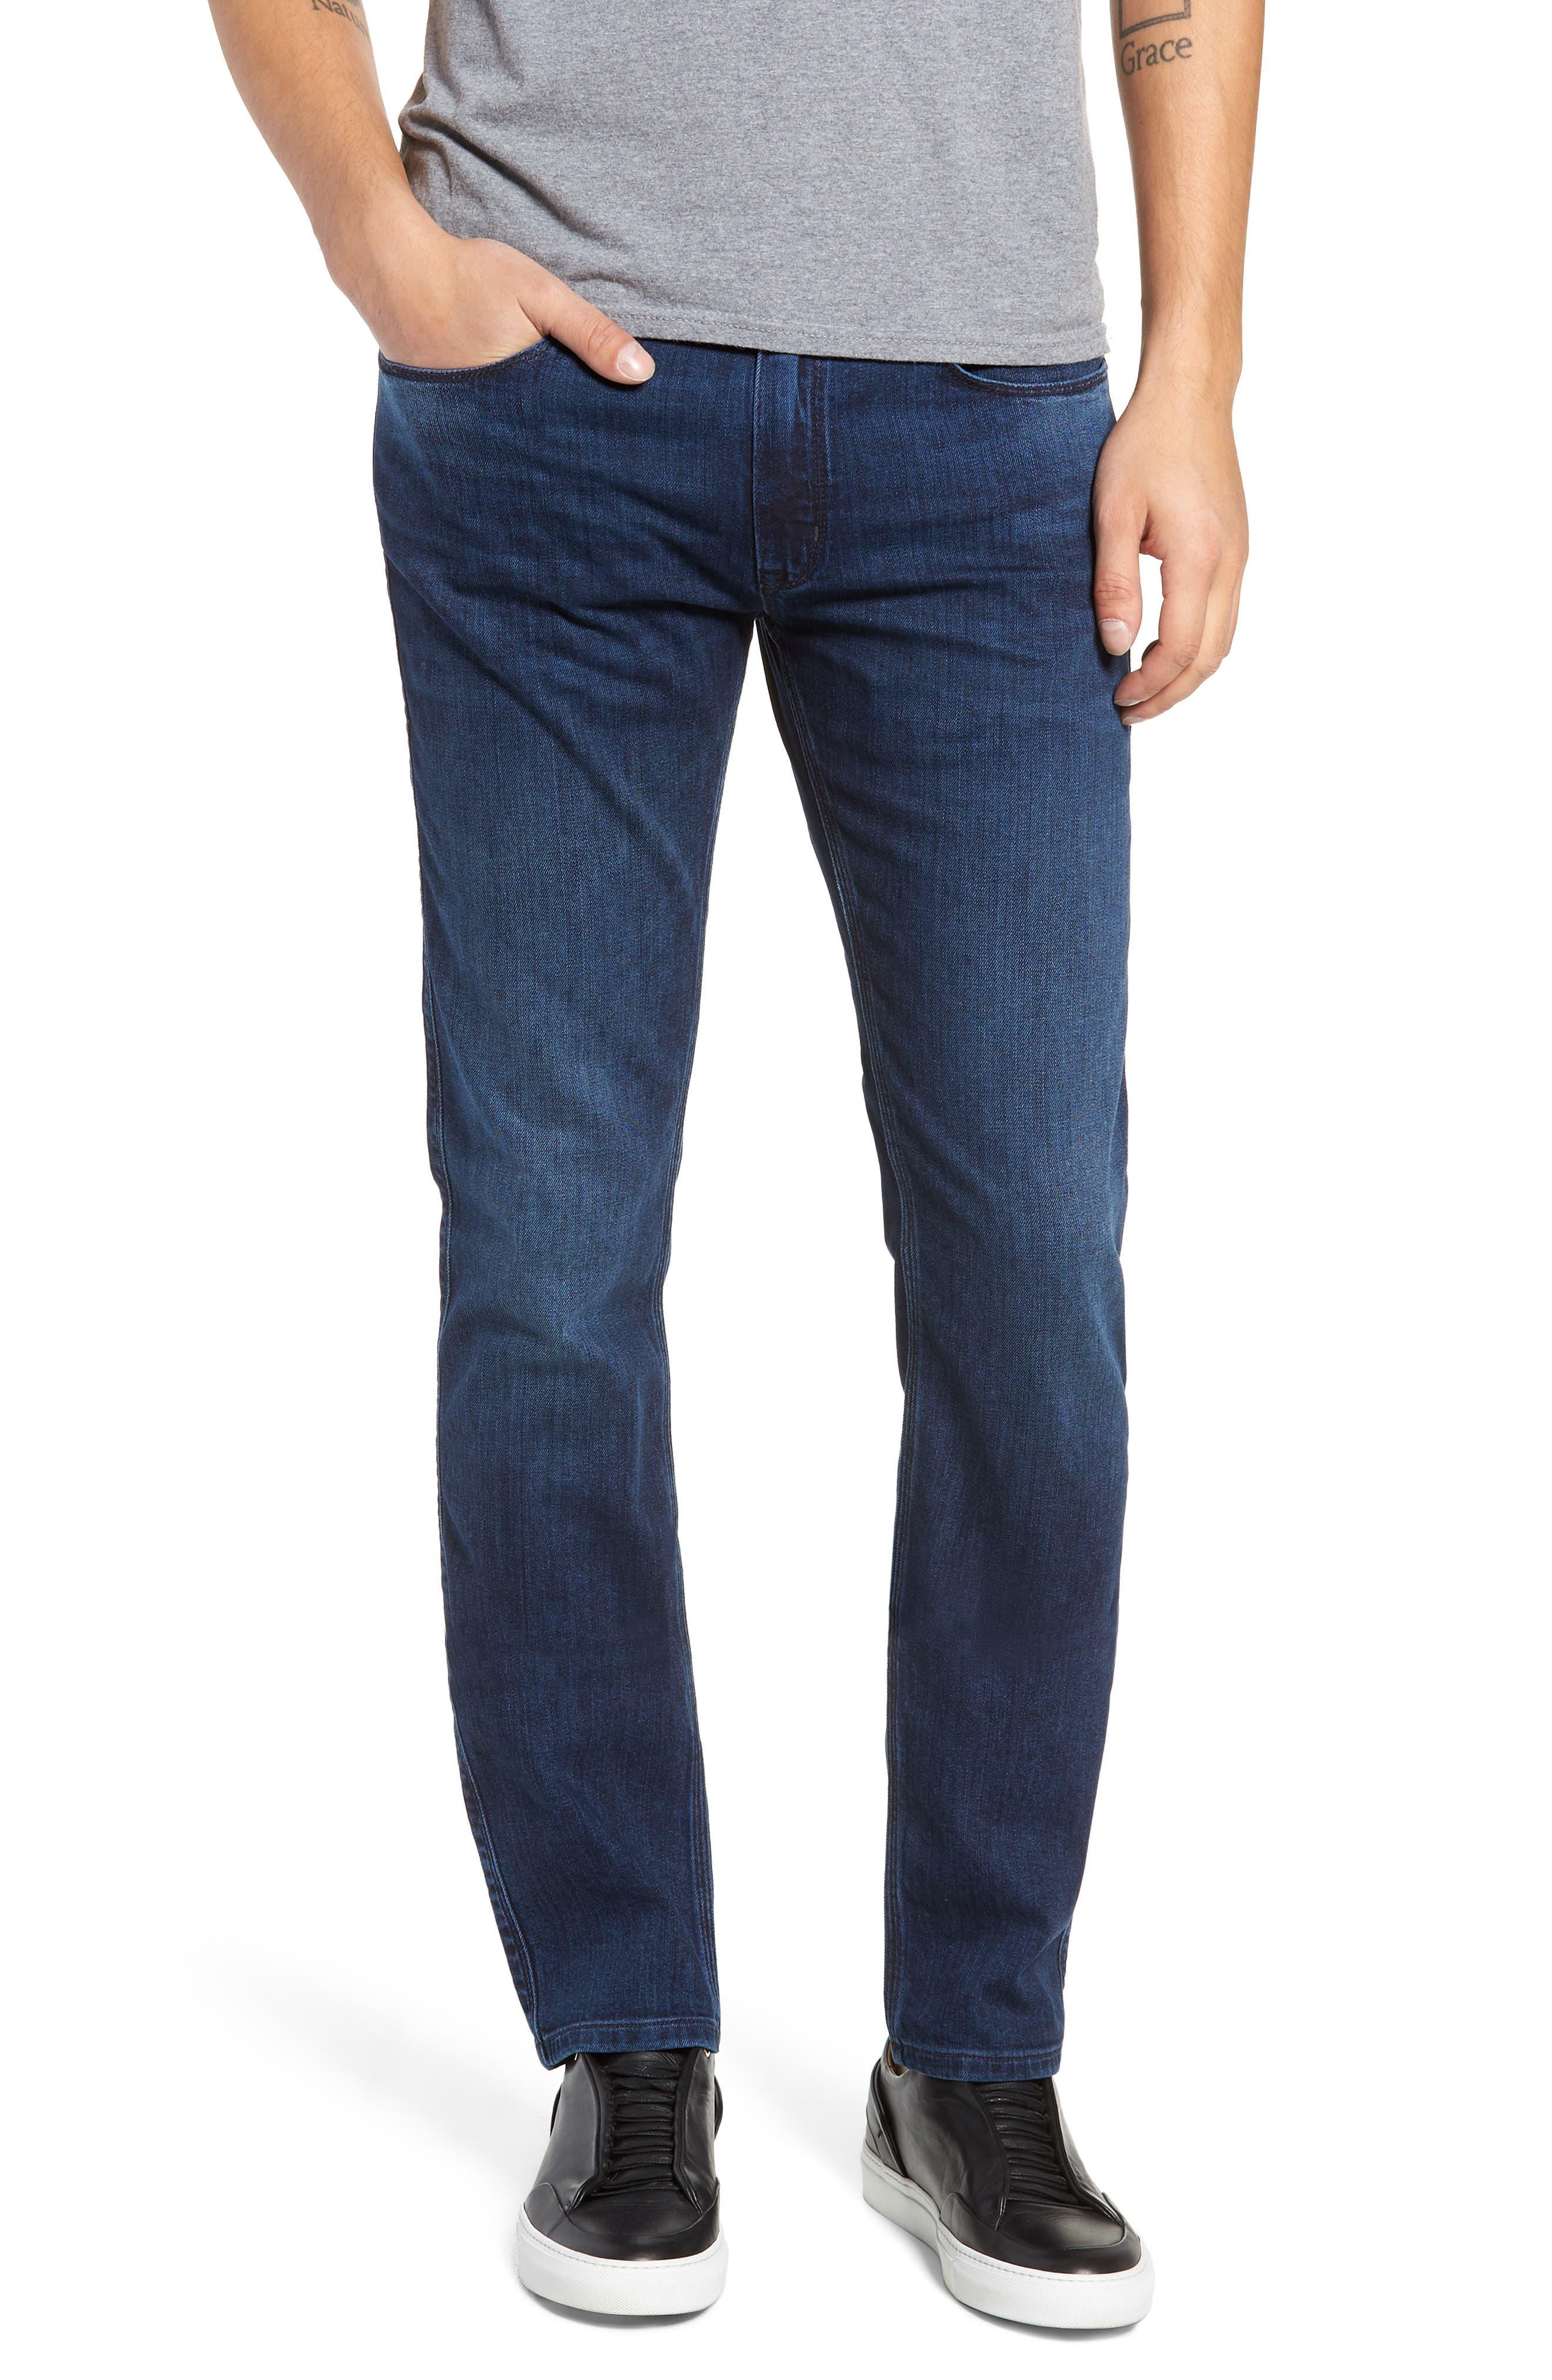 708 Stretch Slim Fit Jeans,                             Main thumbnail 1, color,                             420